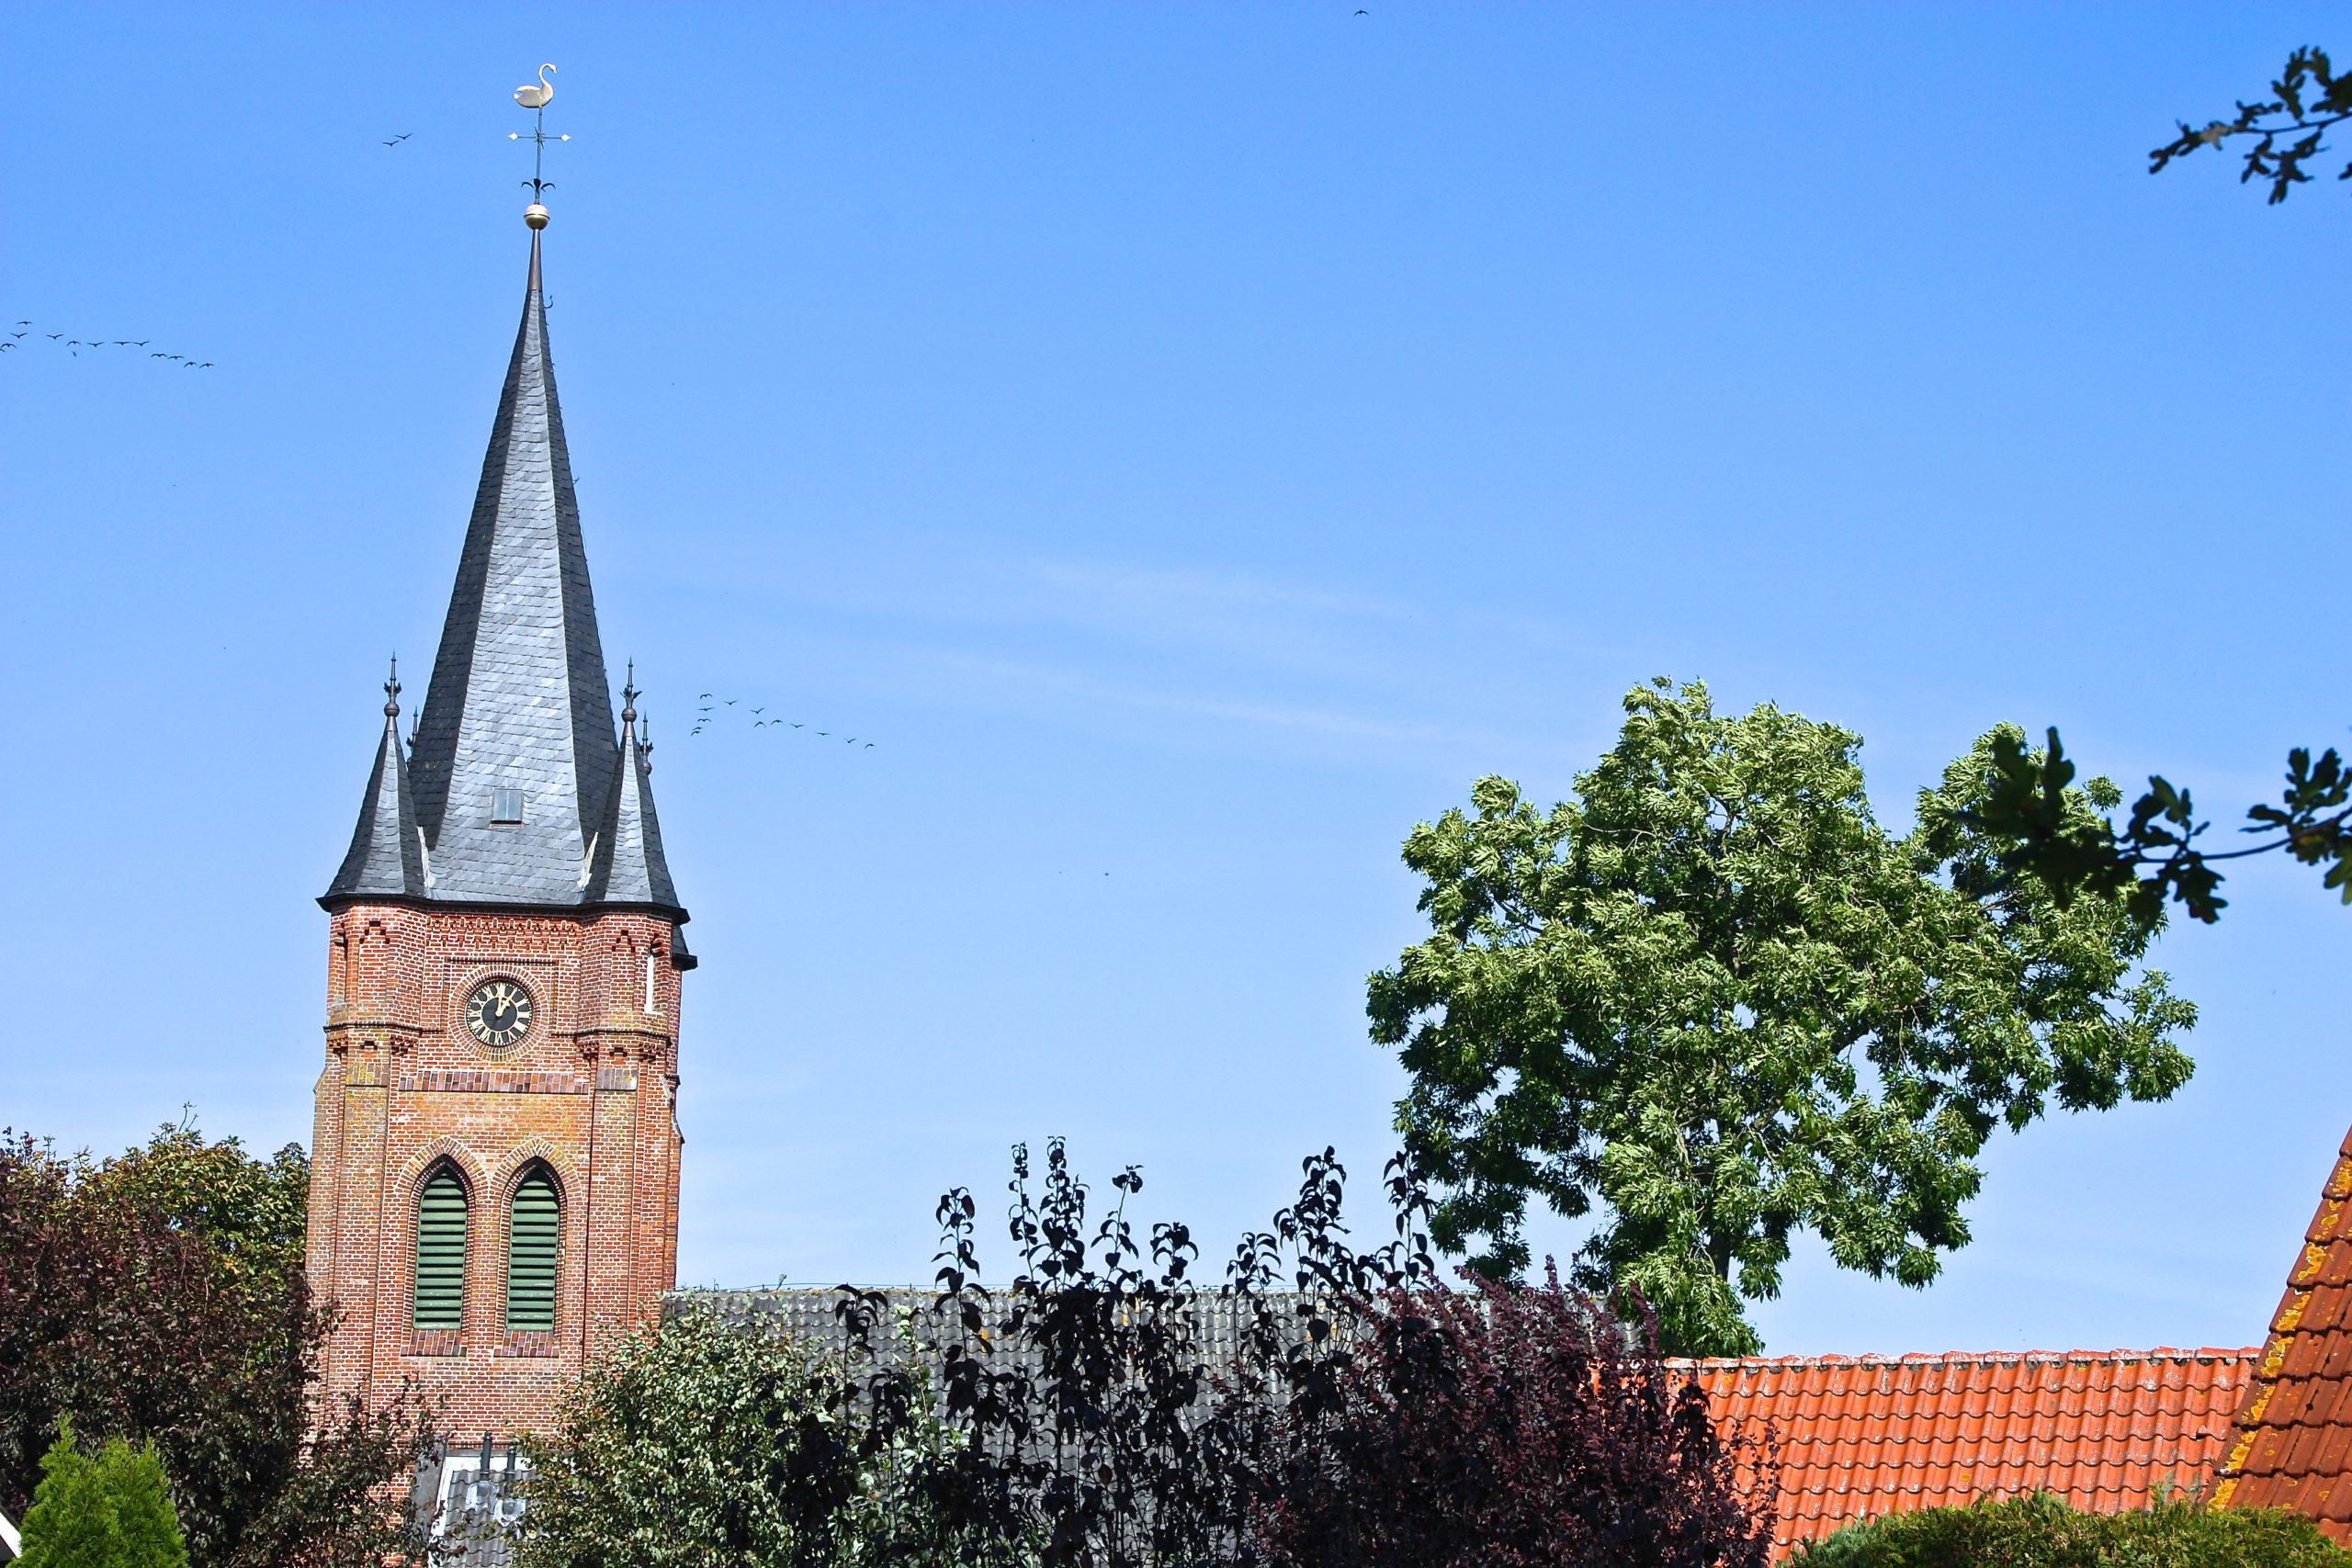 Woquarder Marienkirche